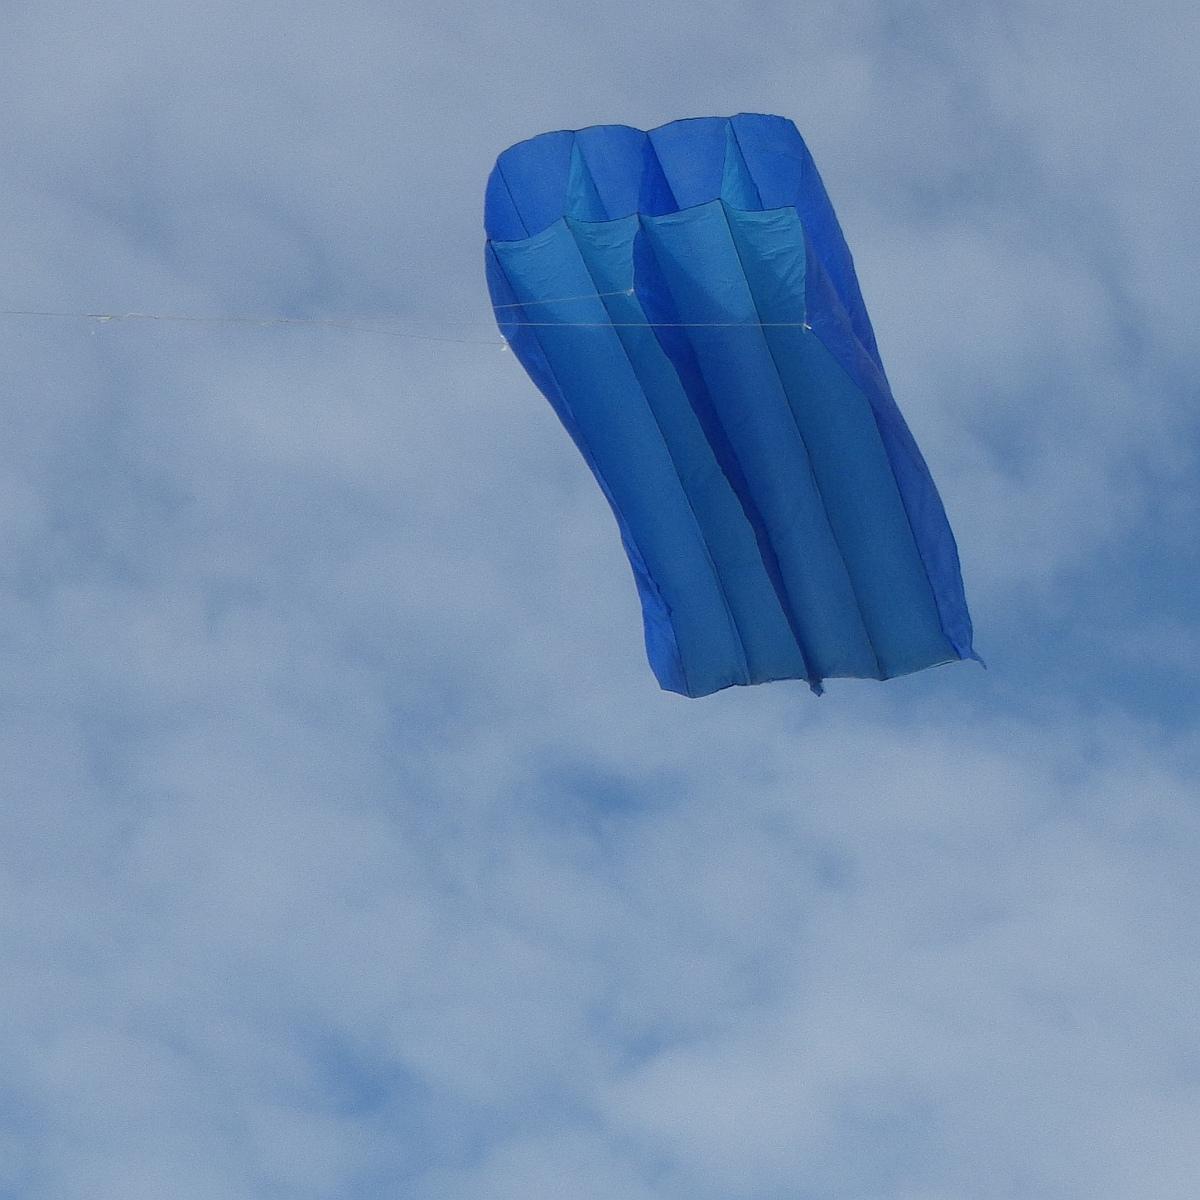 MBK Parafoil kite 1 - 1.